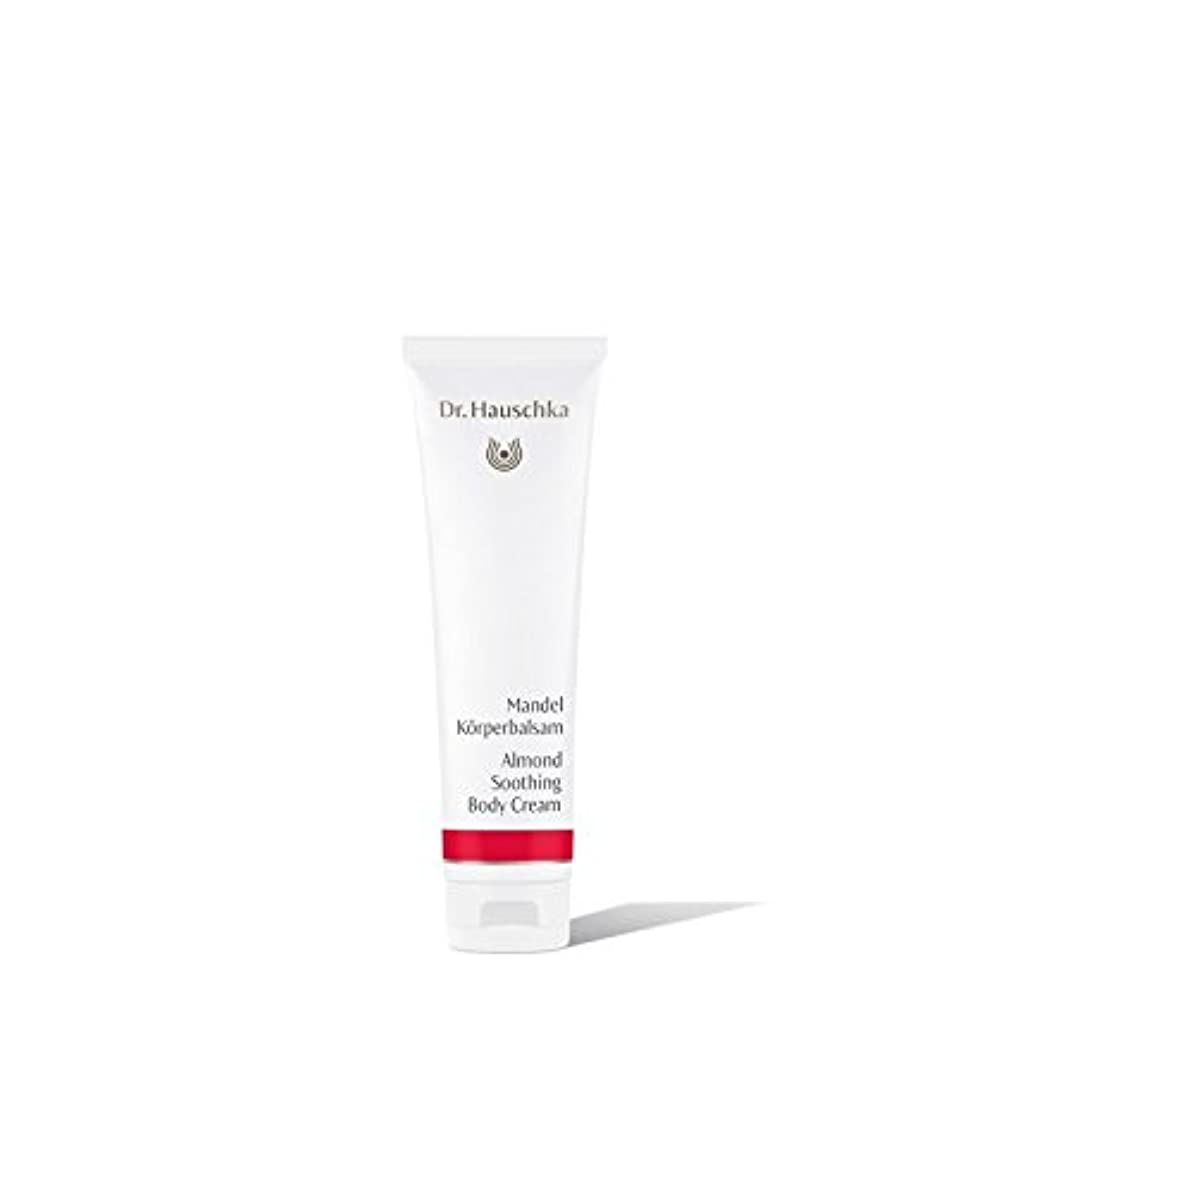 Dr. Hauschka Almond Soothing Body Cream (145ml) - ハウシュカアーモンドなだめるボディクリーム(145ミリリットル) [並行輸入品]